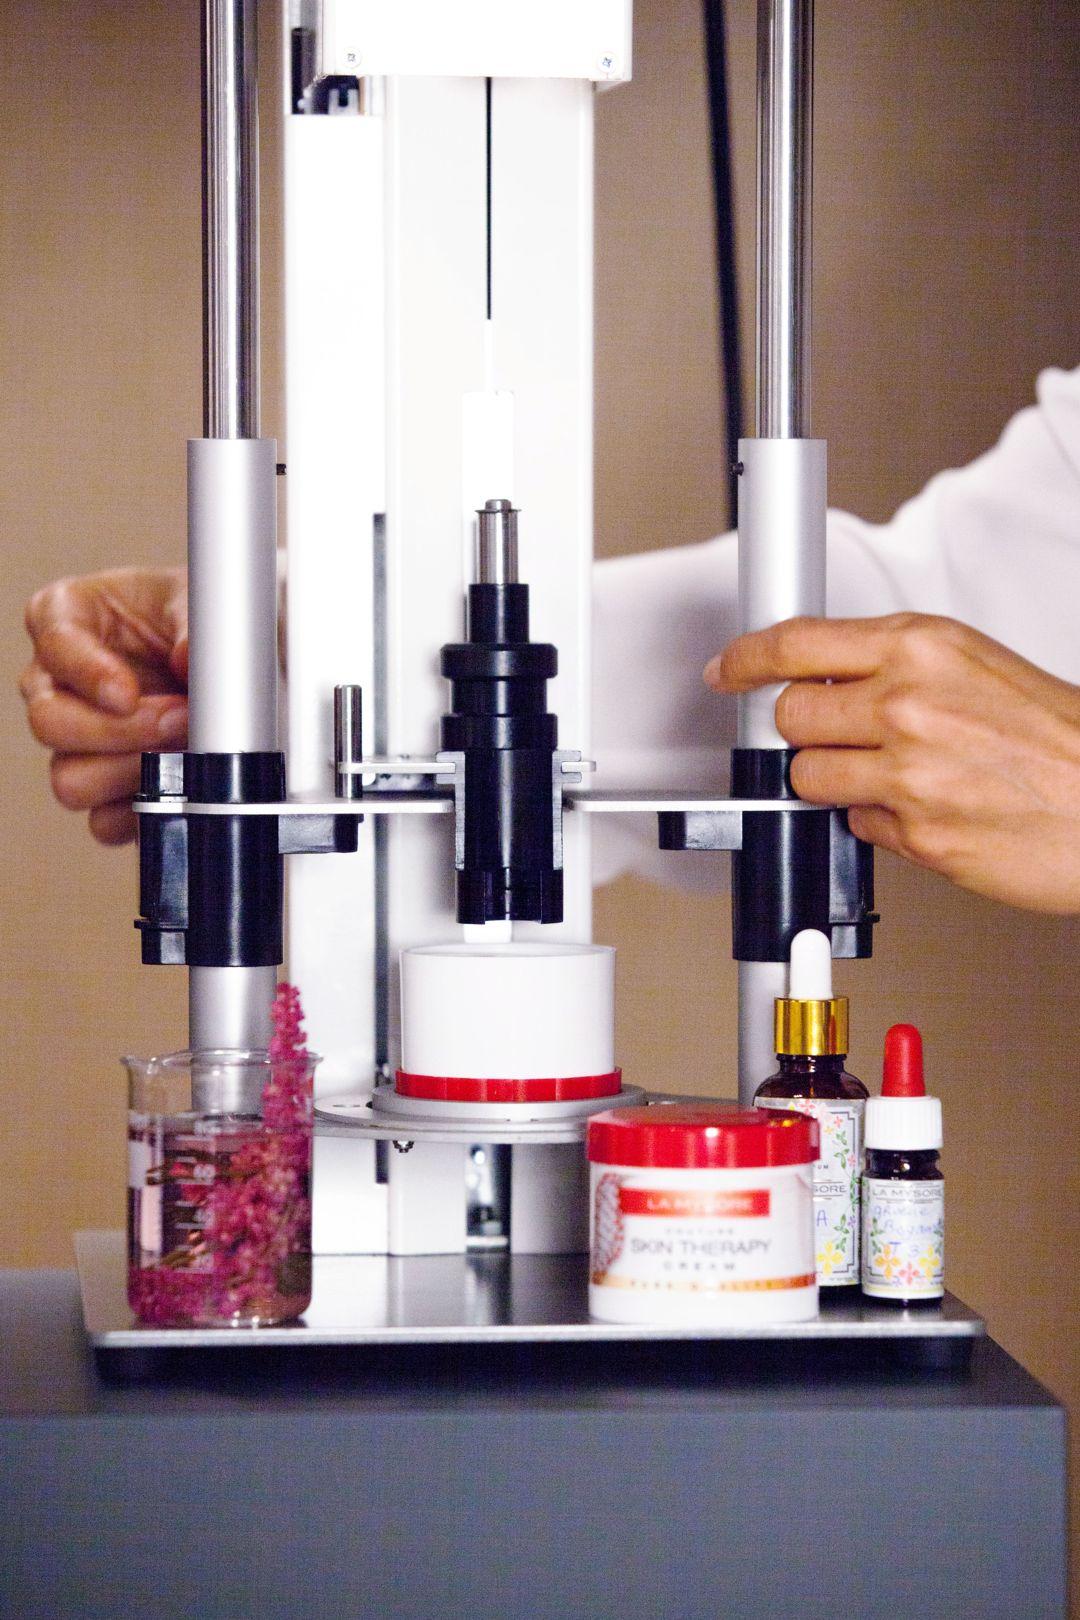 La Mysore Cosmetics: Huidverzorging op maat: the next step